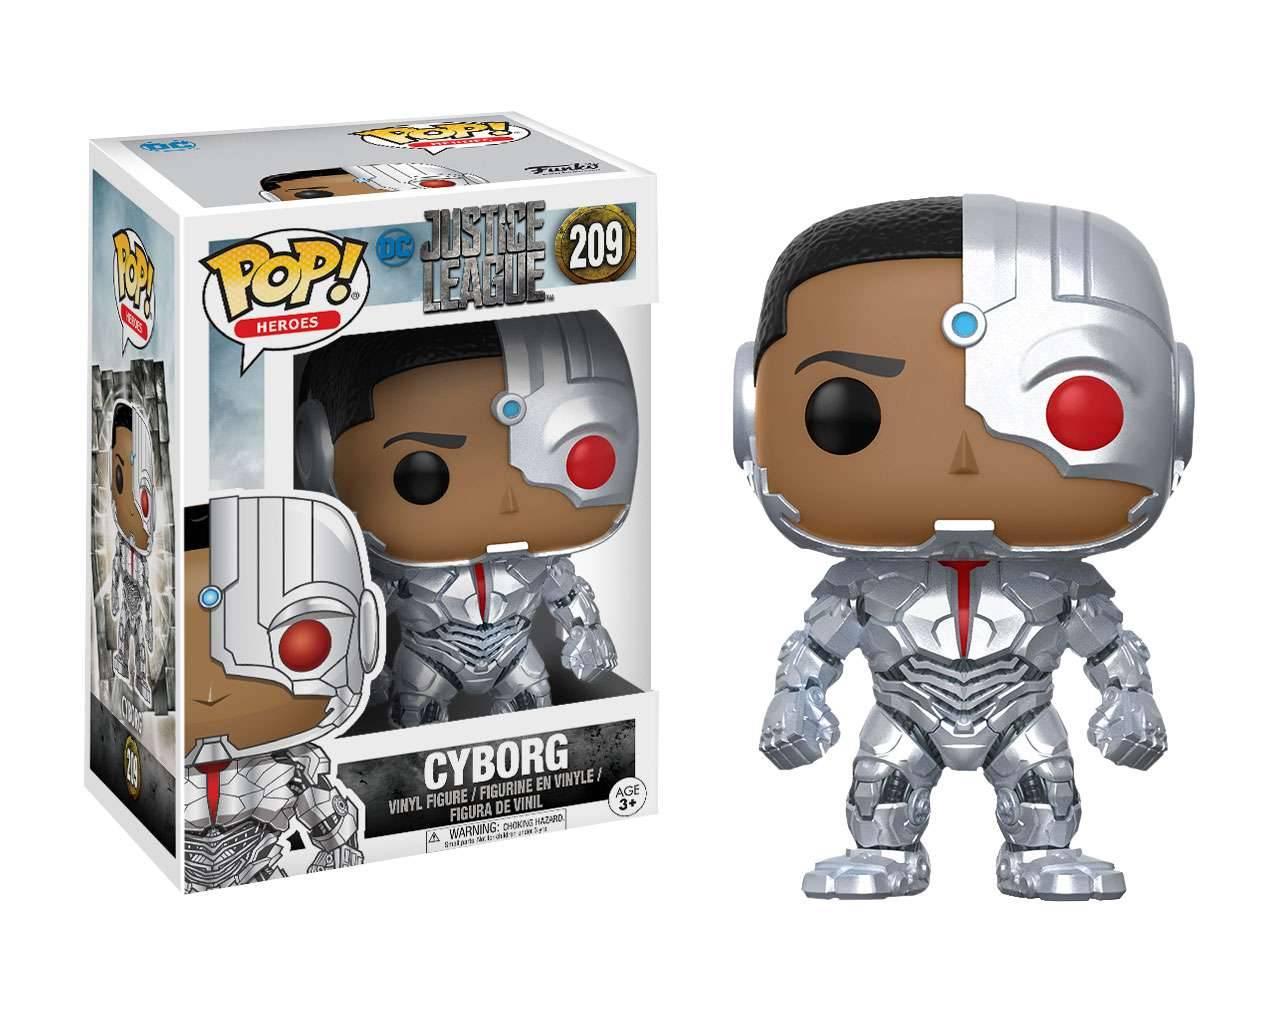 Cyborg Pop! Vinyl